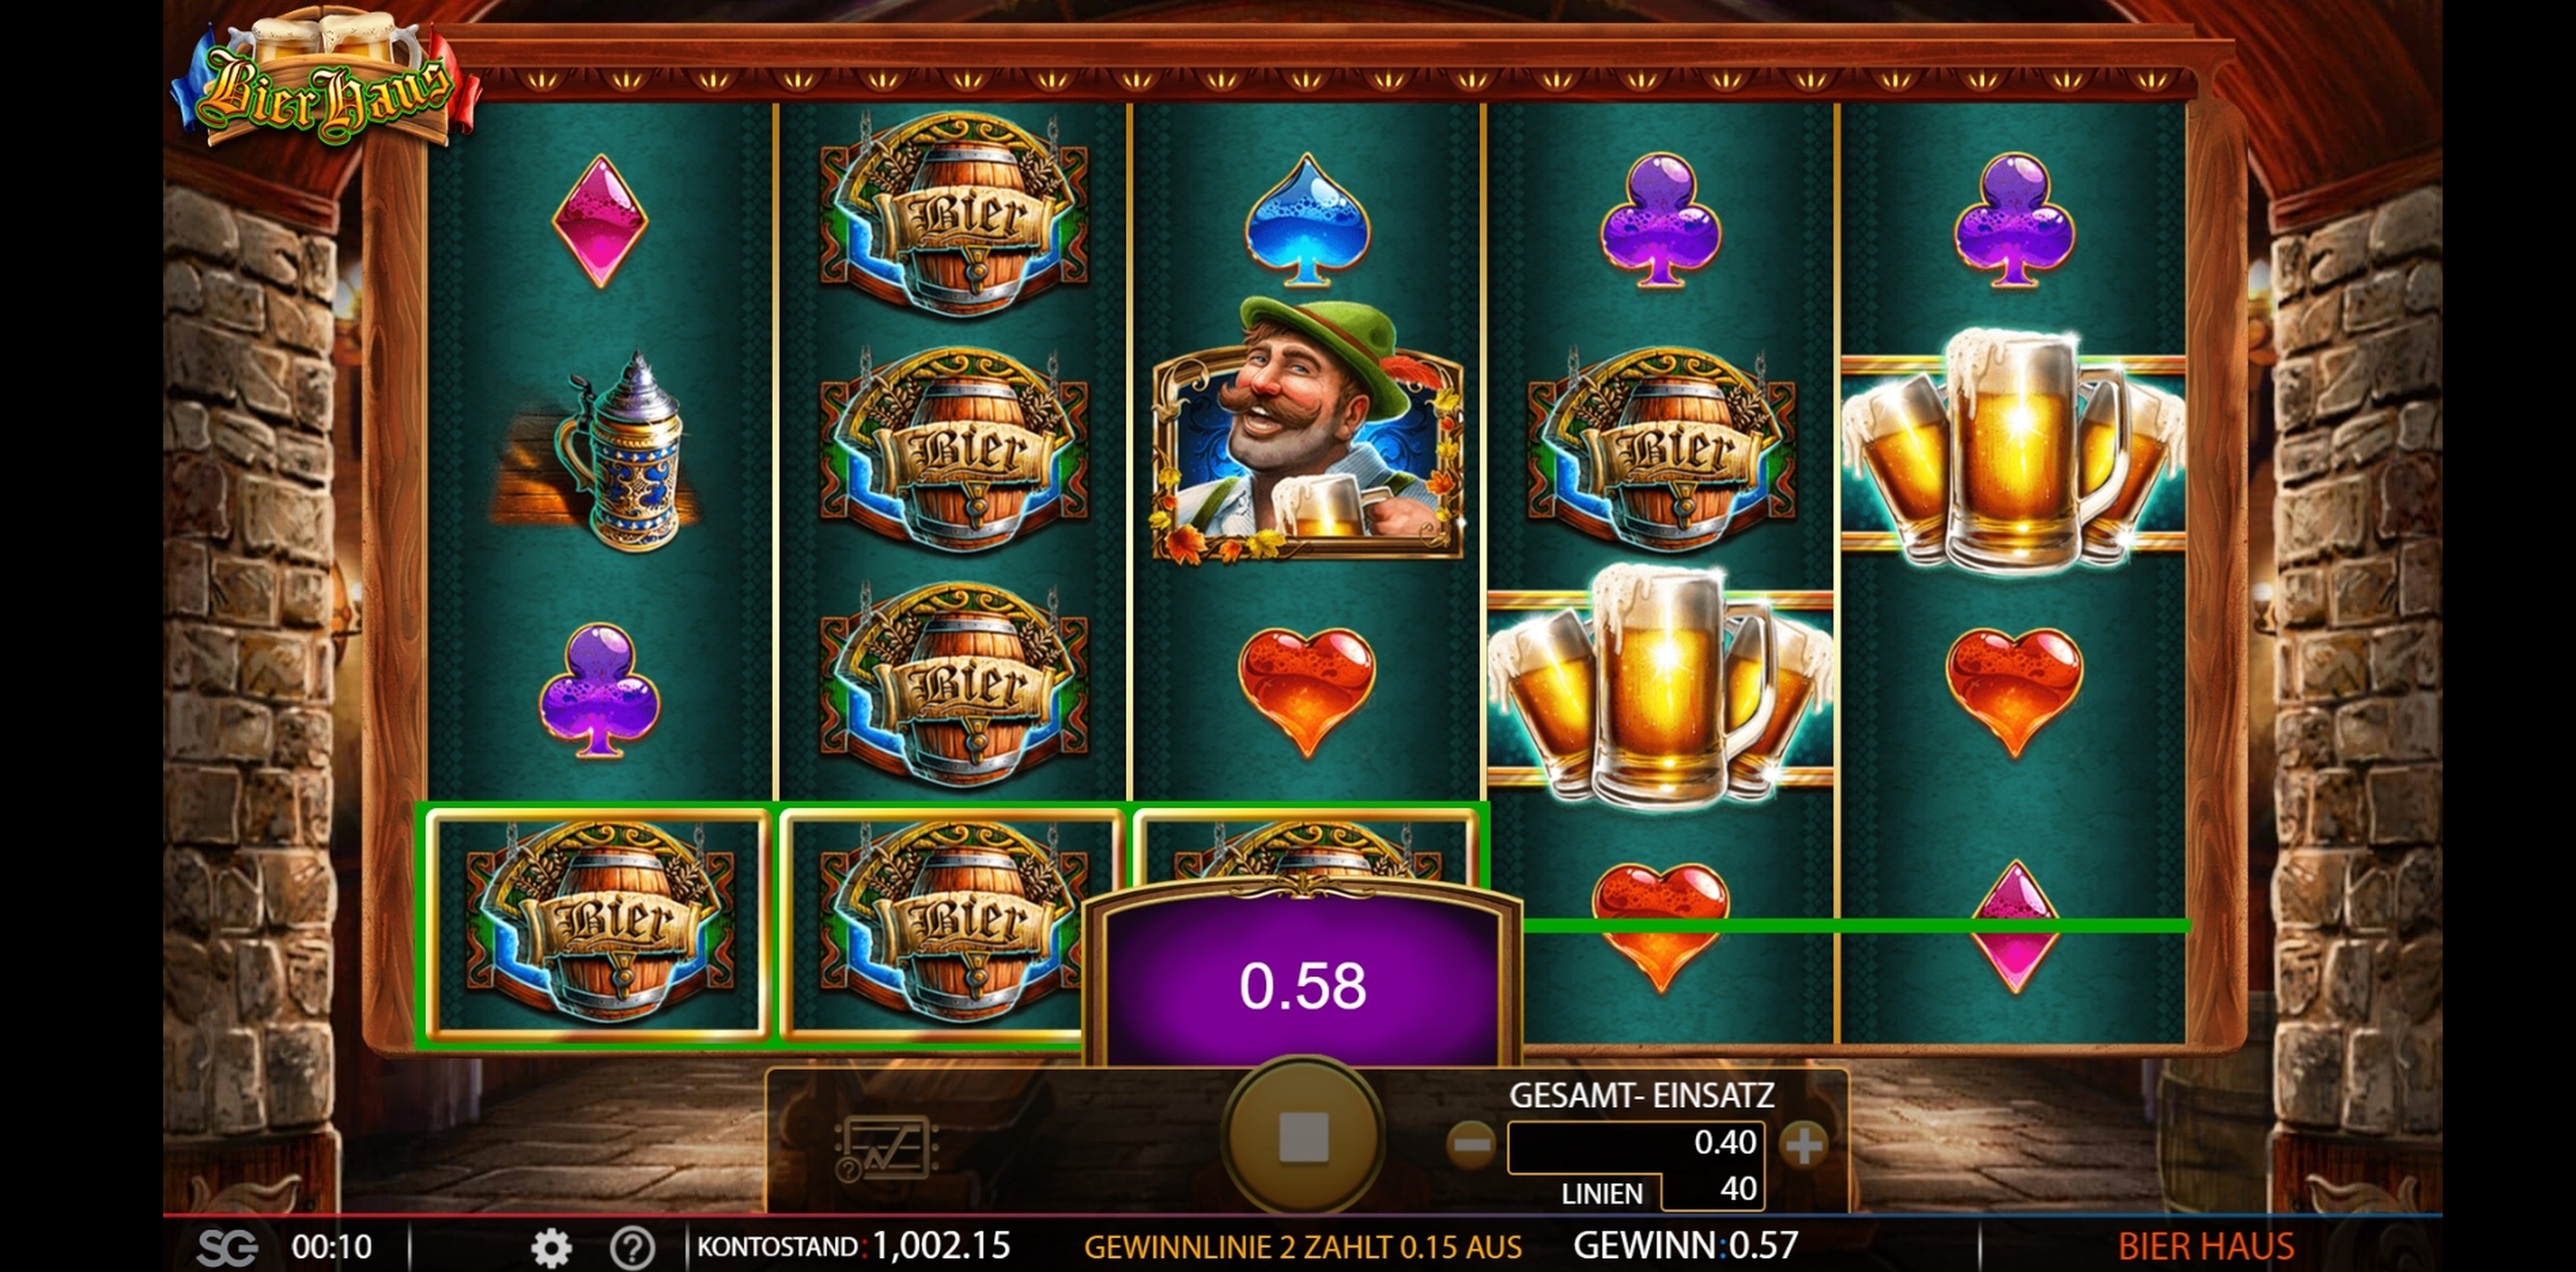 Blackjack basic strategy 6 deck